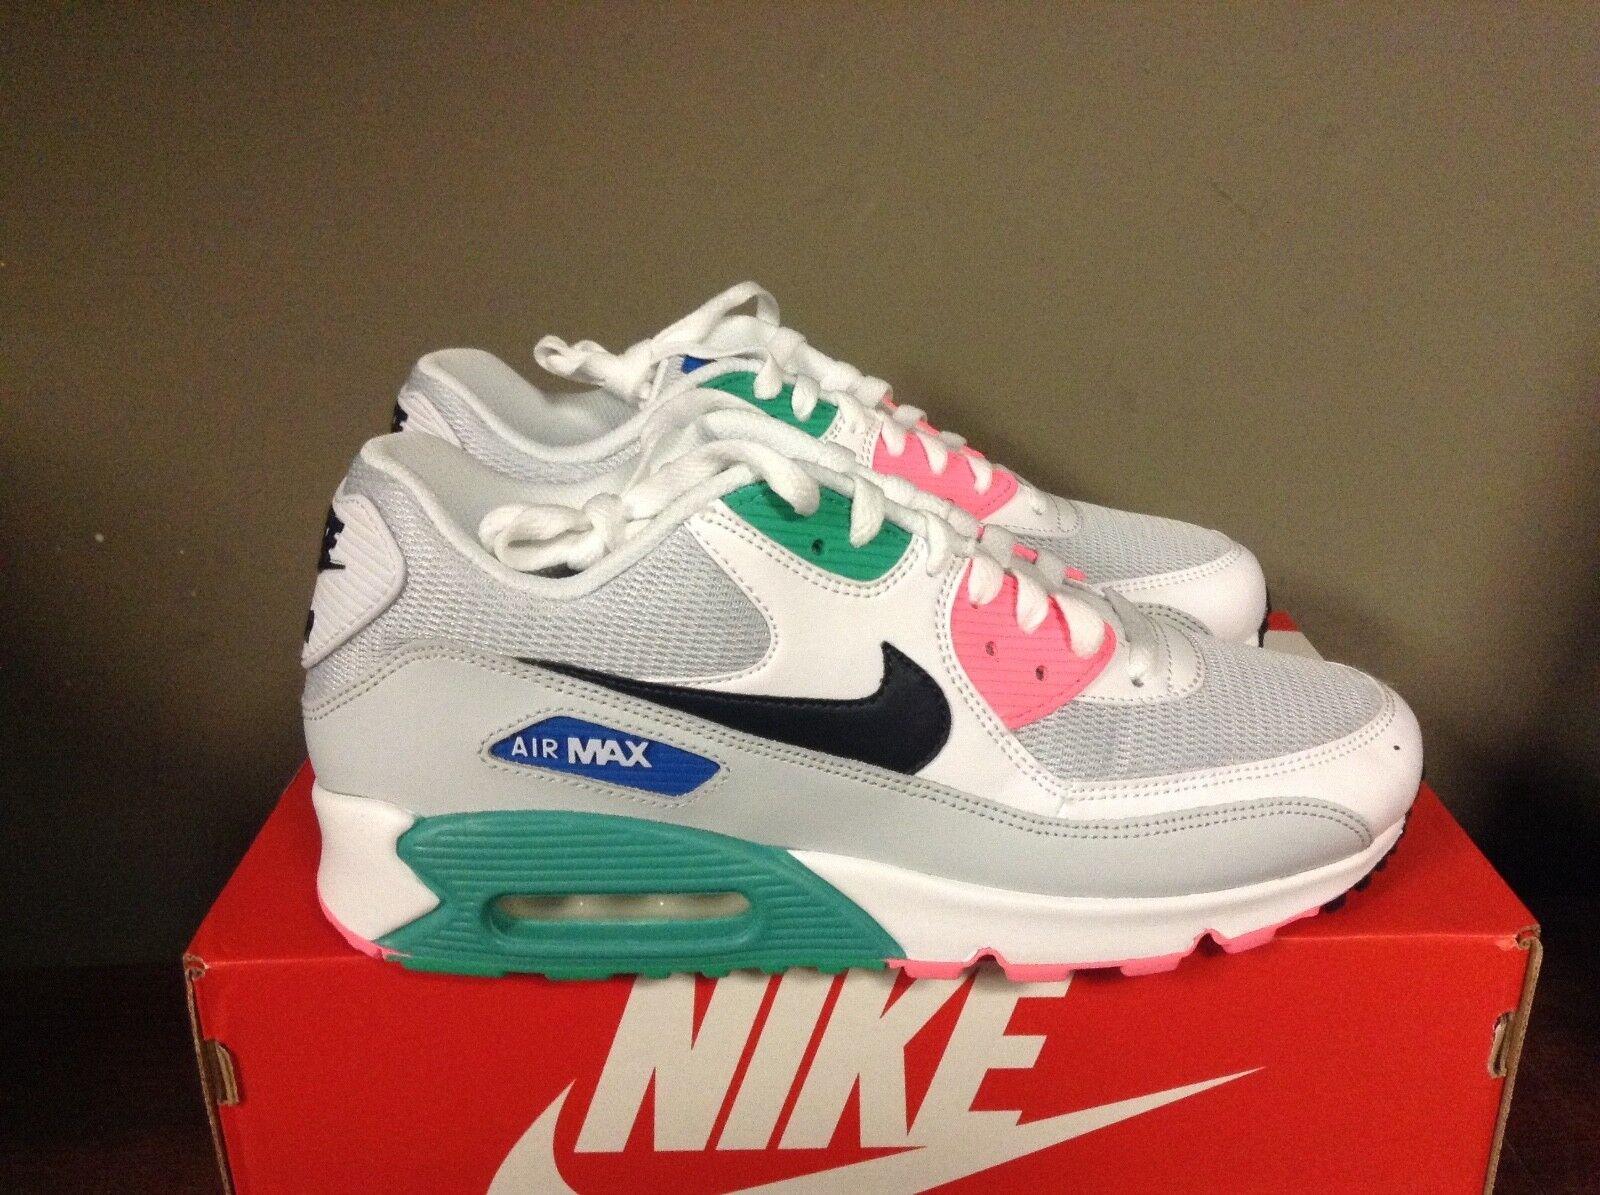 Nike air max 90 uomini essenziali cosa / obsidian-pure platinum-blue aj1285 100 nuovi